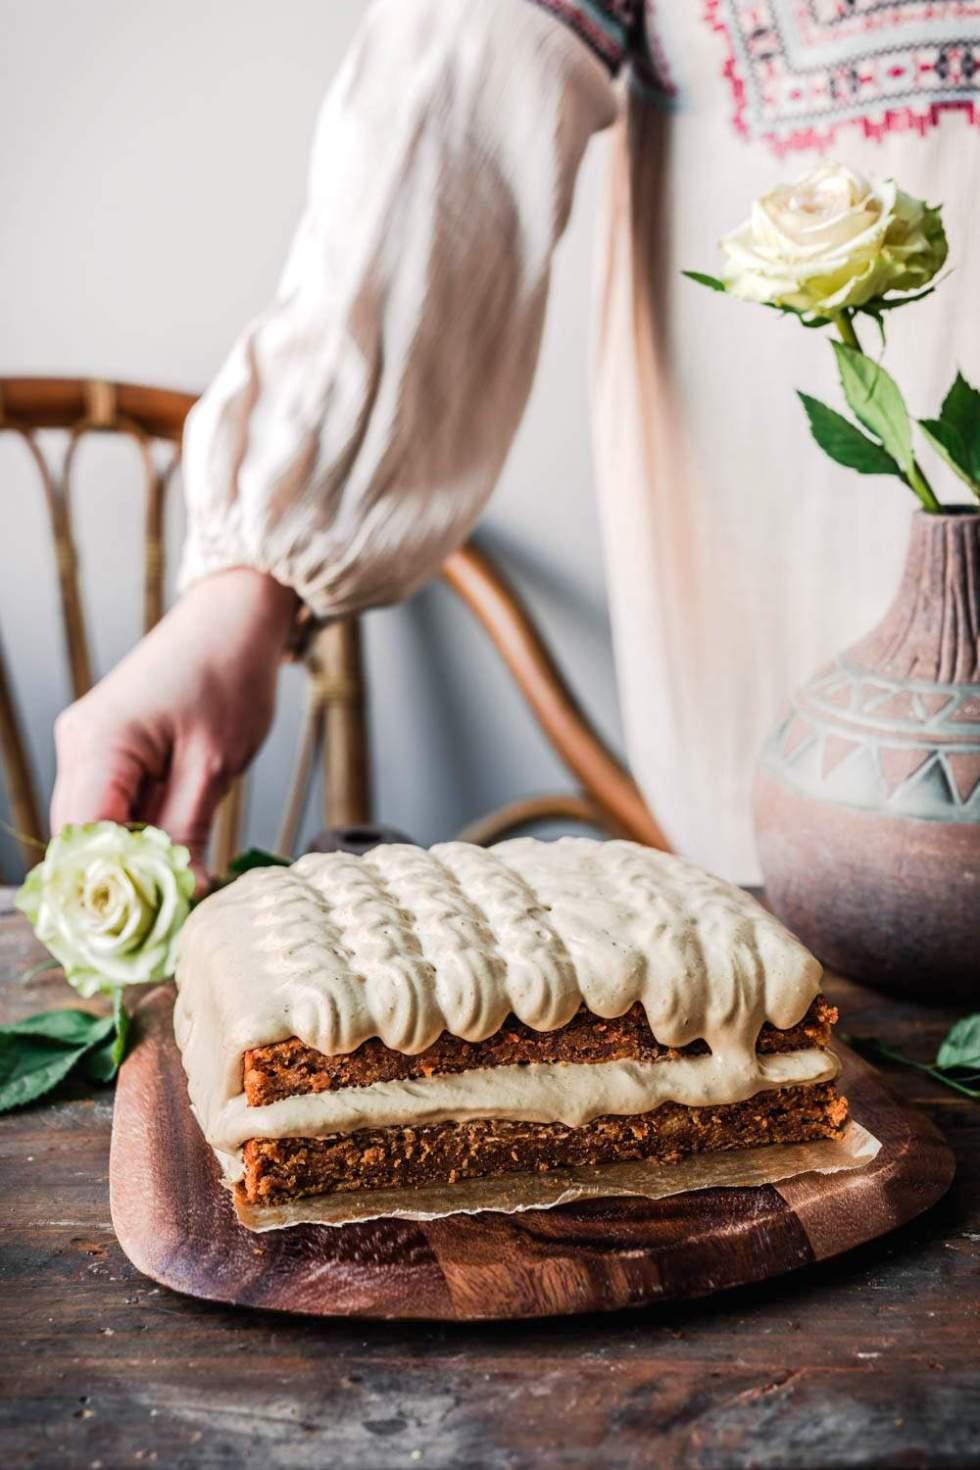 Vegan Banana Cake with Peanut Butter Mousse